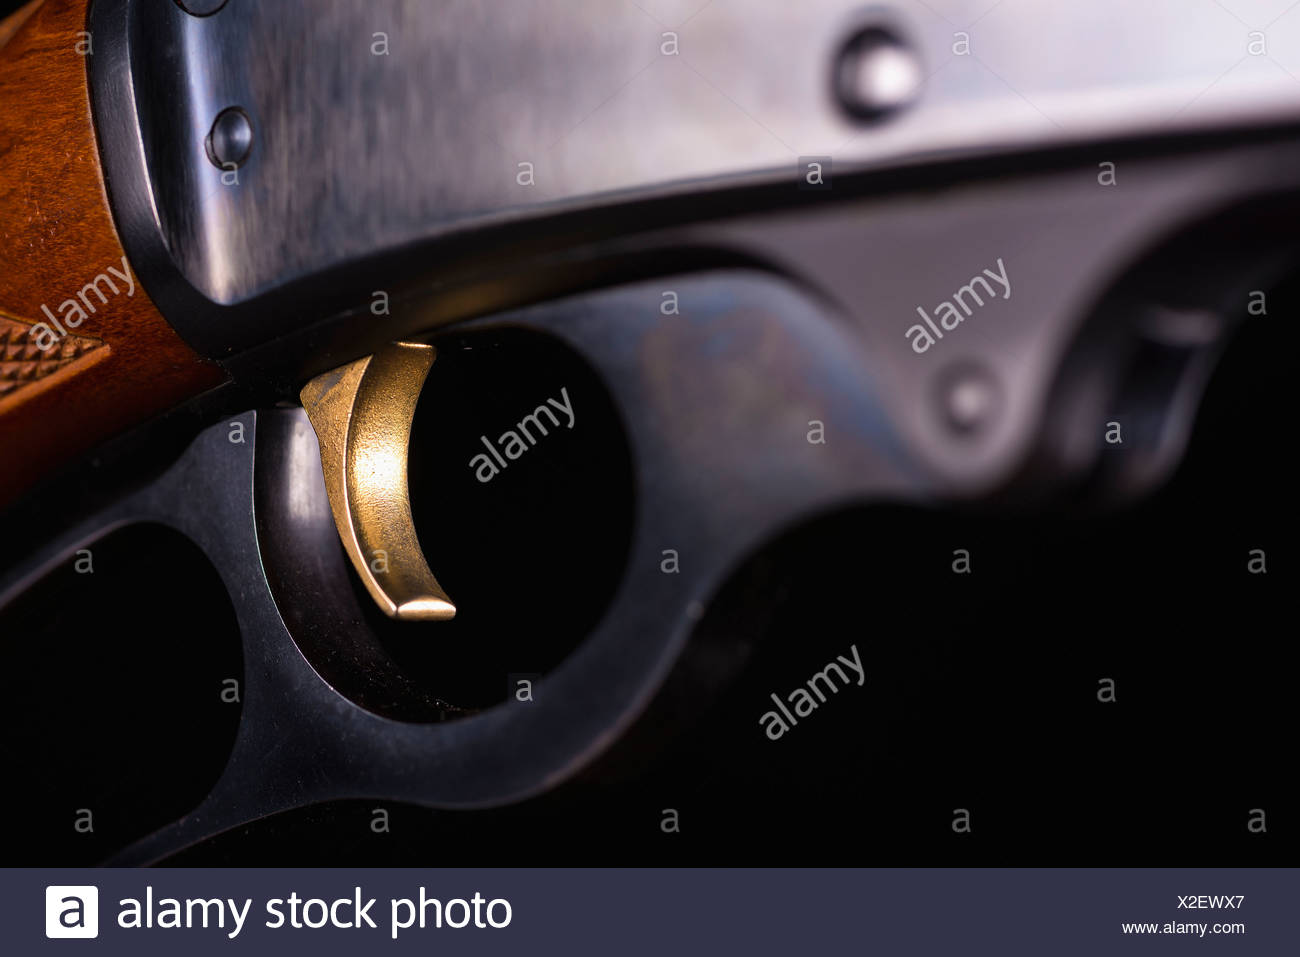 Trigger of gun against black background, close up - Stock Image